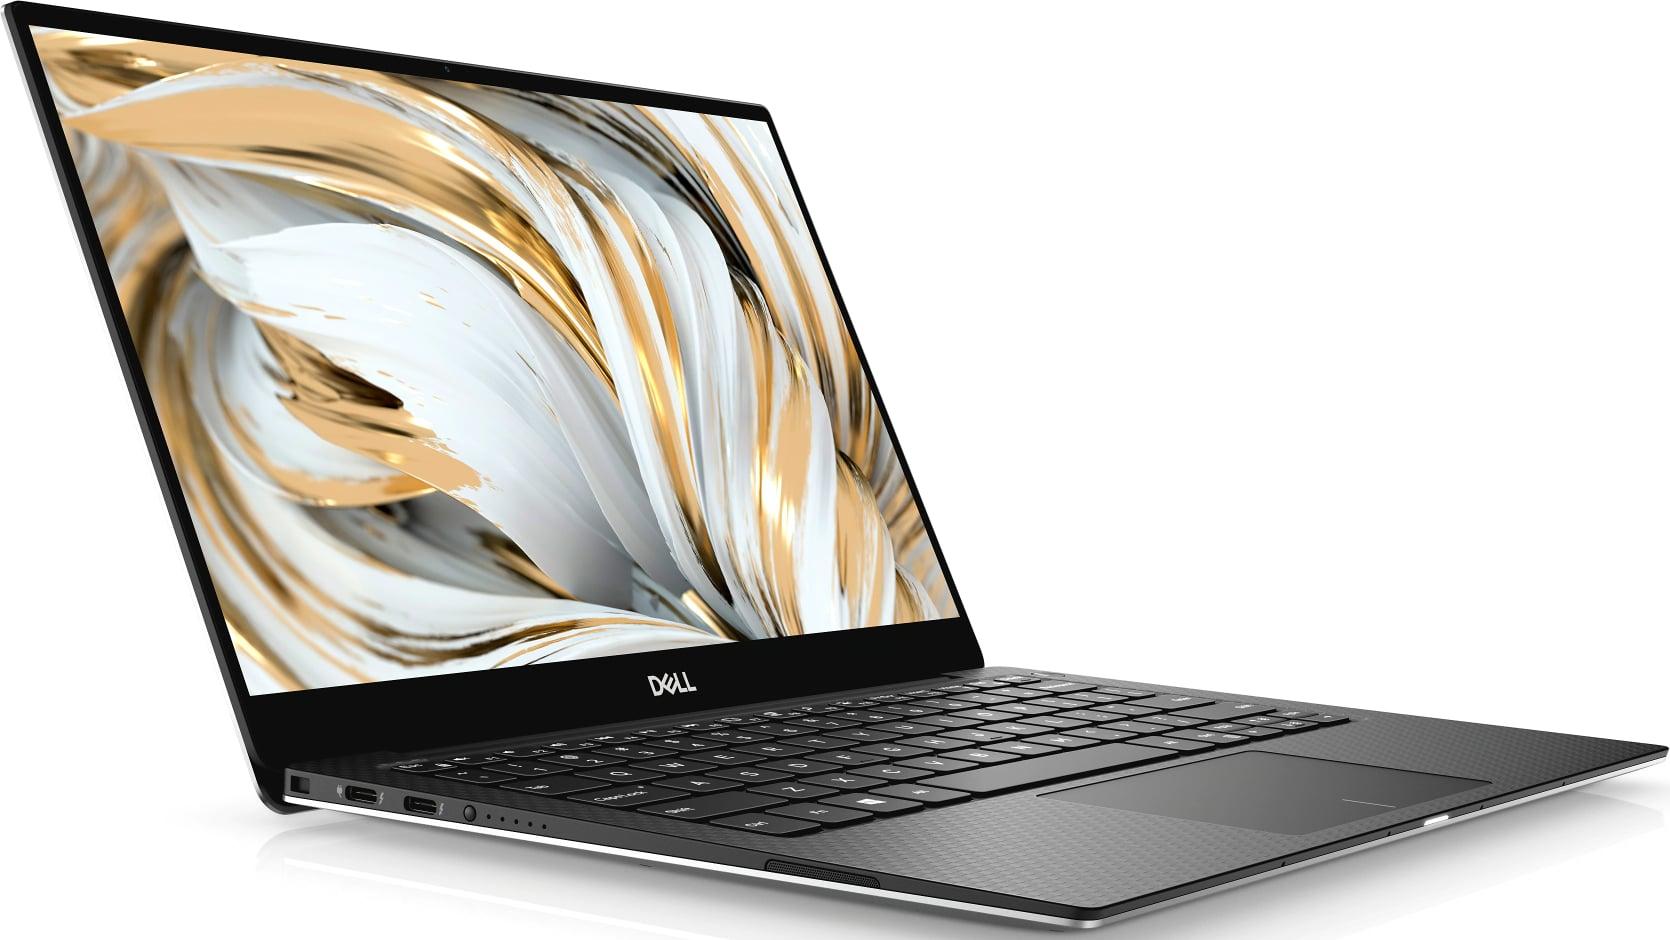 171425400 1859327654244437 8880676243124556885 n Laptop Lê Sơn